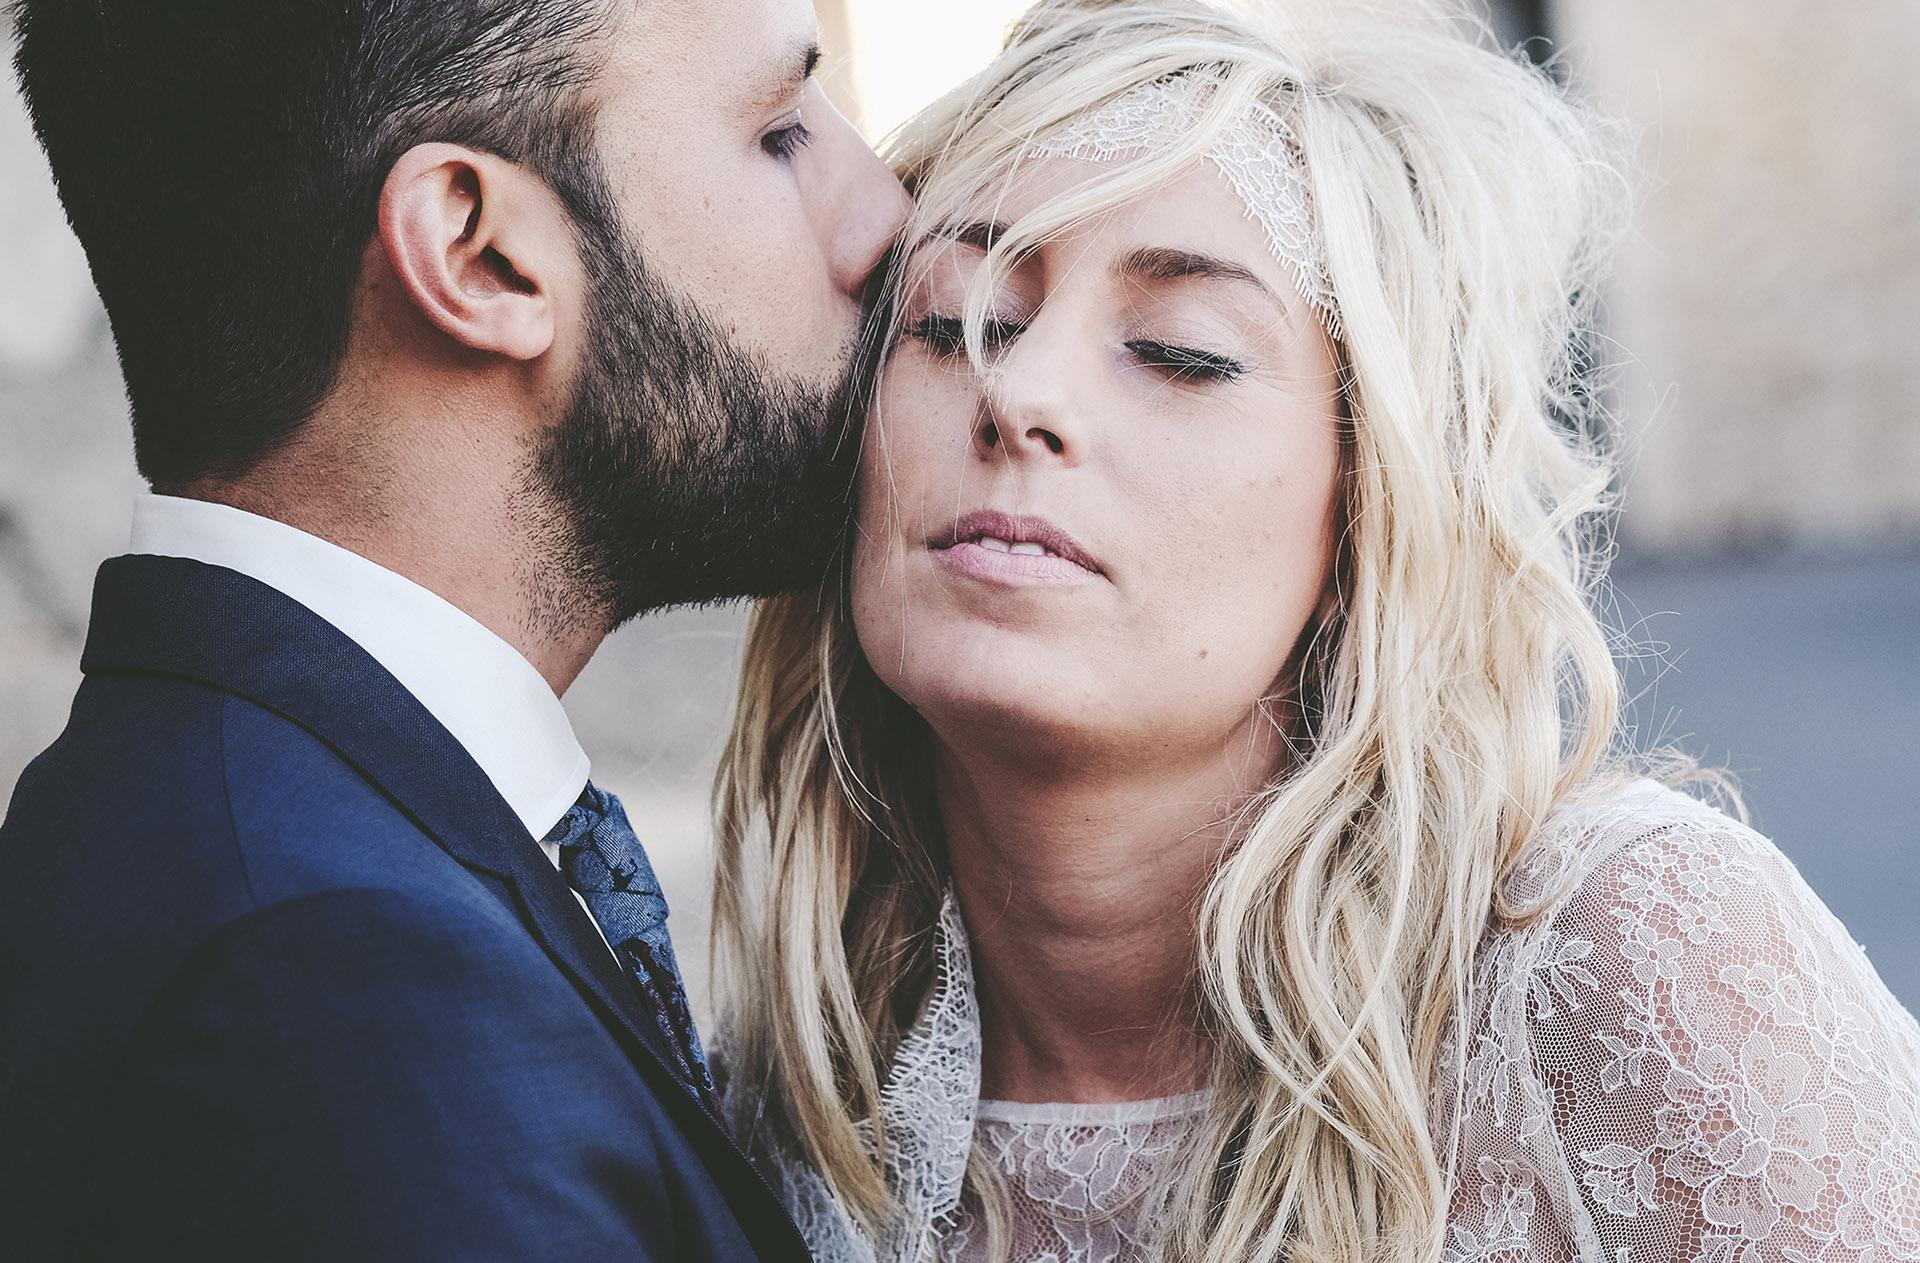 photographe mariage antibes - Photographe Mariage Antibes